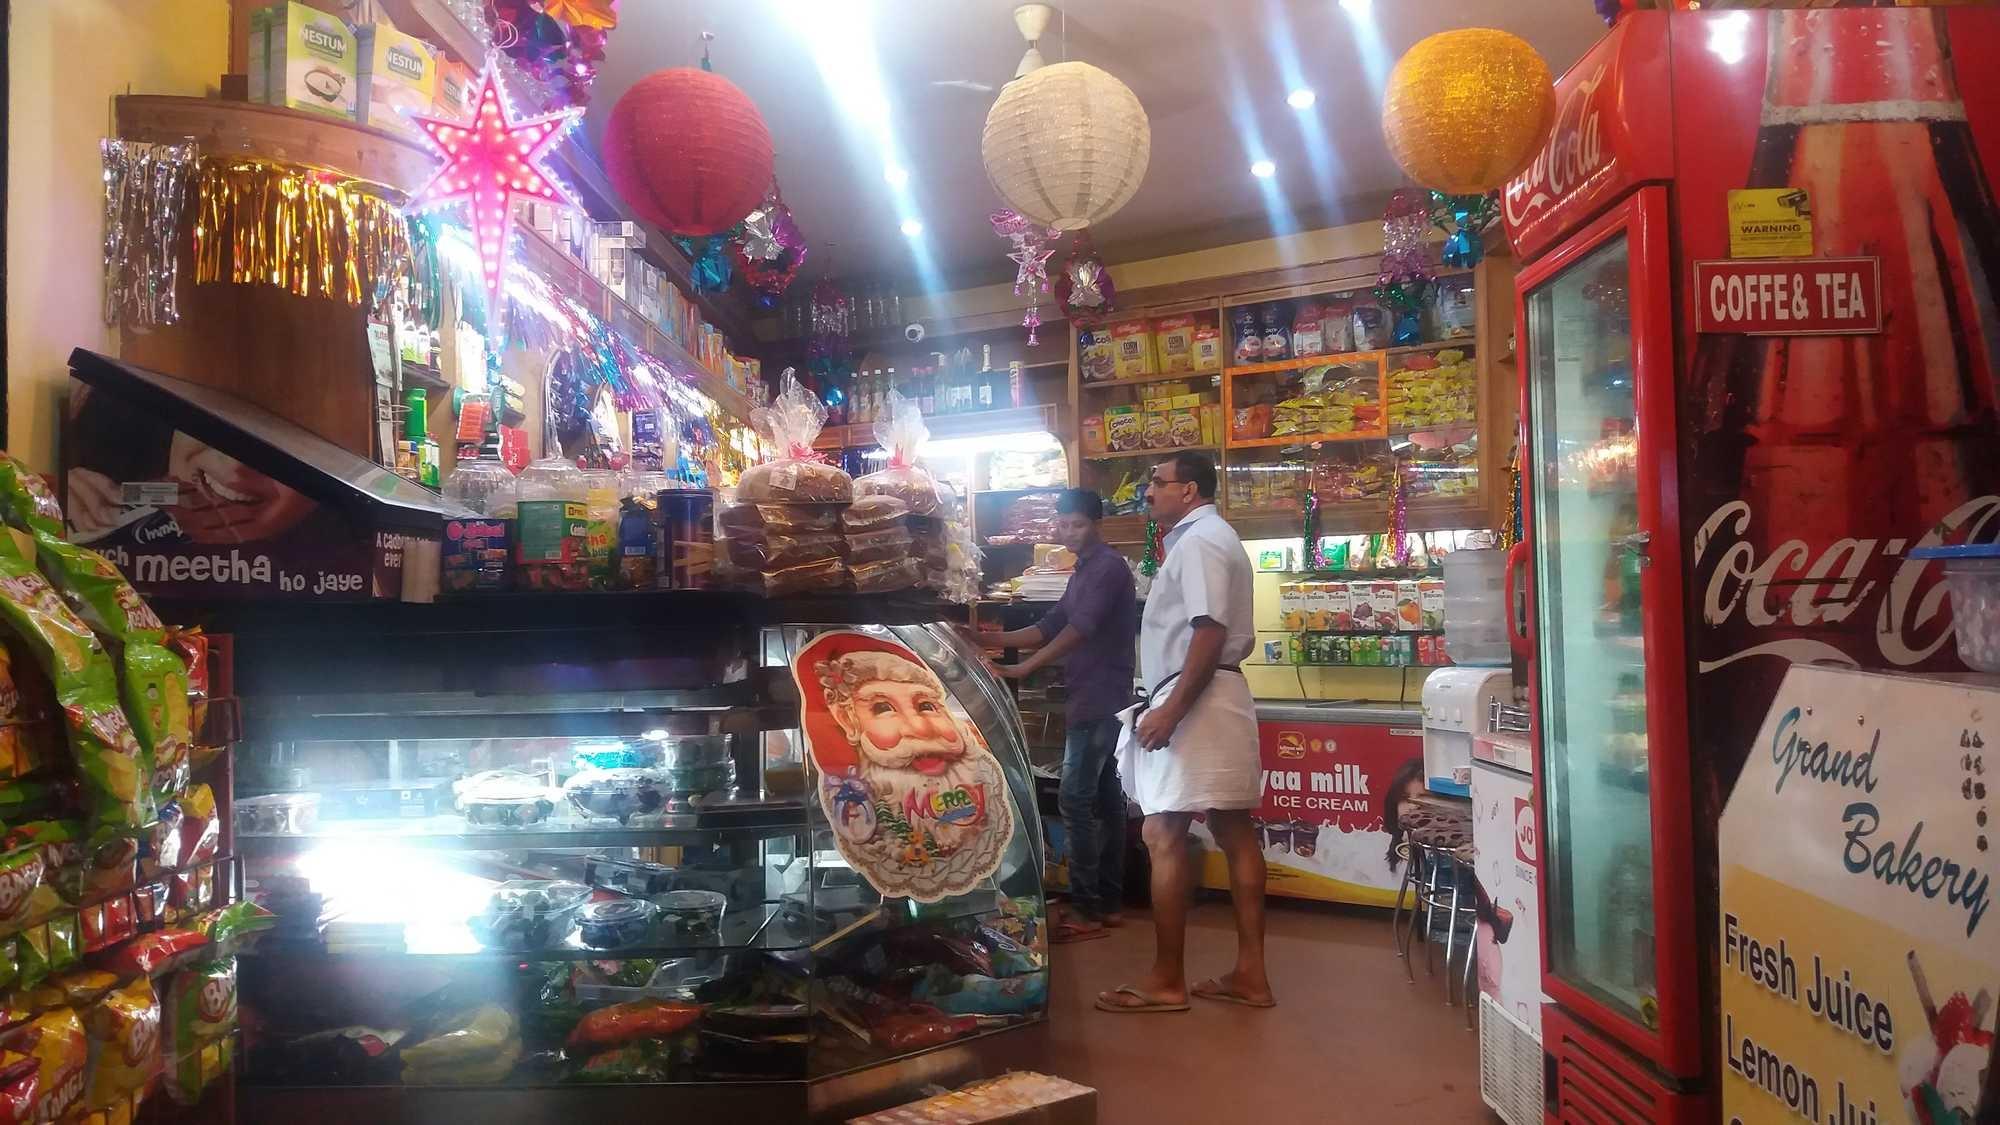 Grand Bakery, Backery & Cafeteria,  service in Kozhencherry, Pathanamthitta